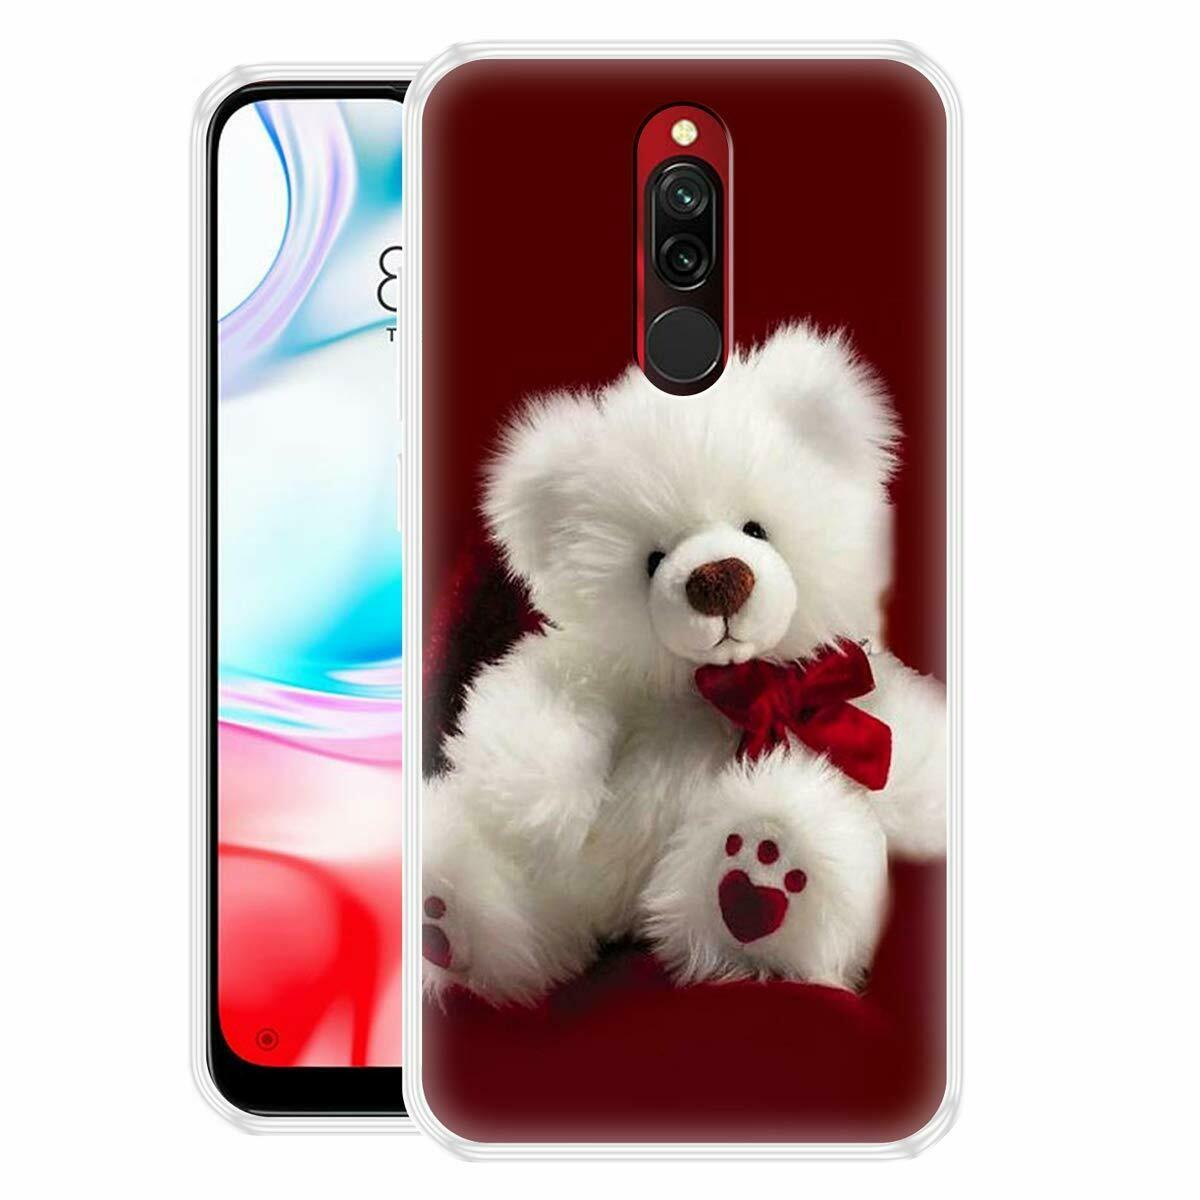 White Teddy Printed Mobile Back Cover for Xiaomi Redmi 8 (Slim Fit, Durable)(Multicolor)